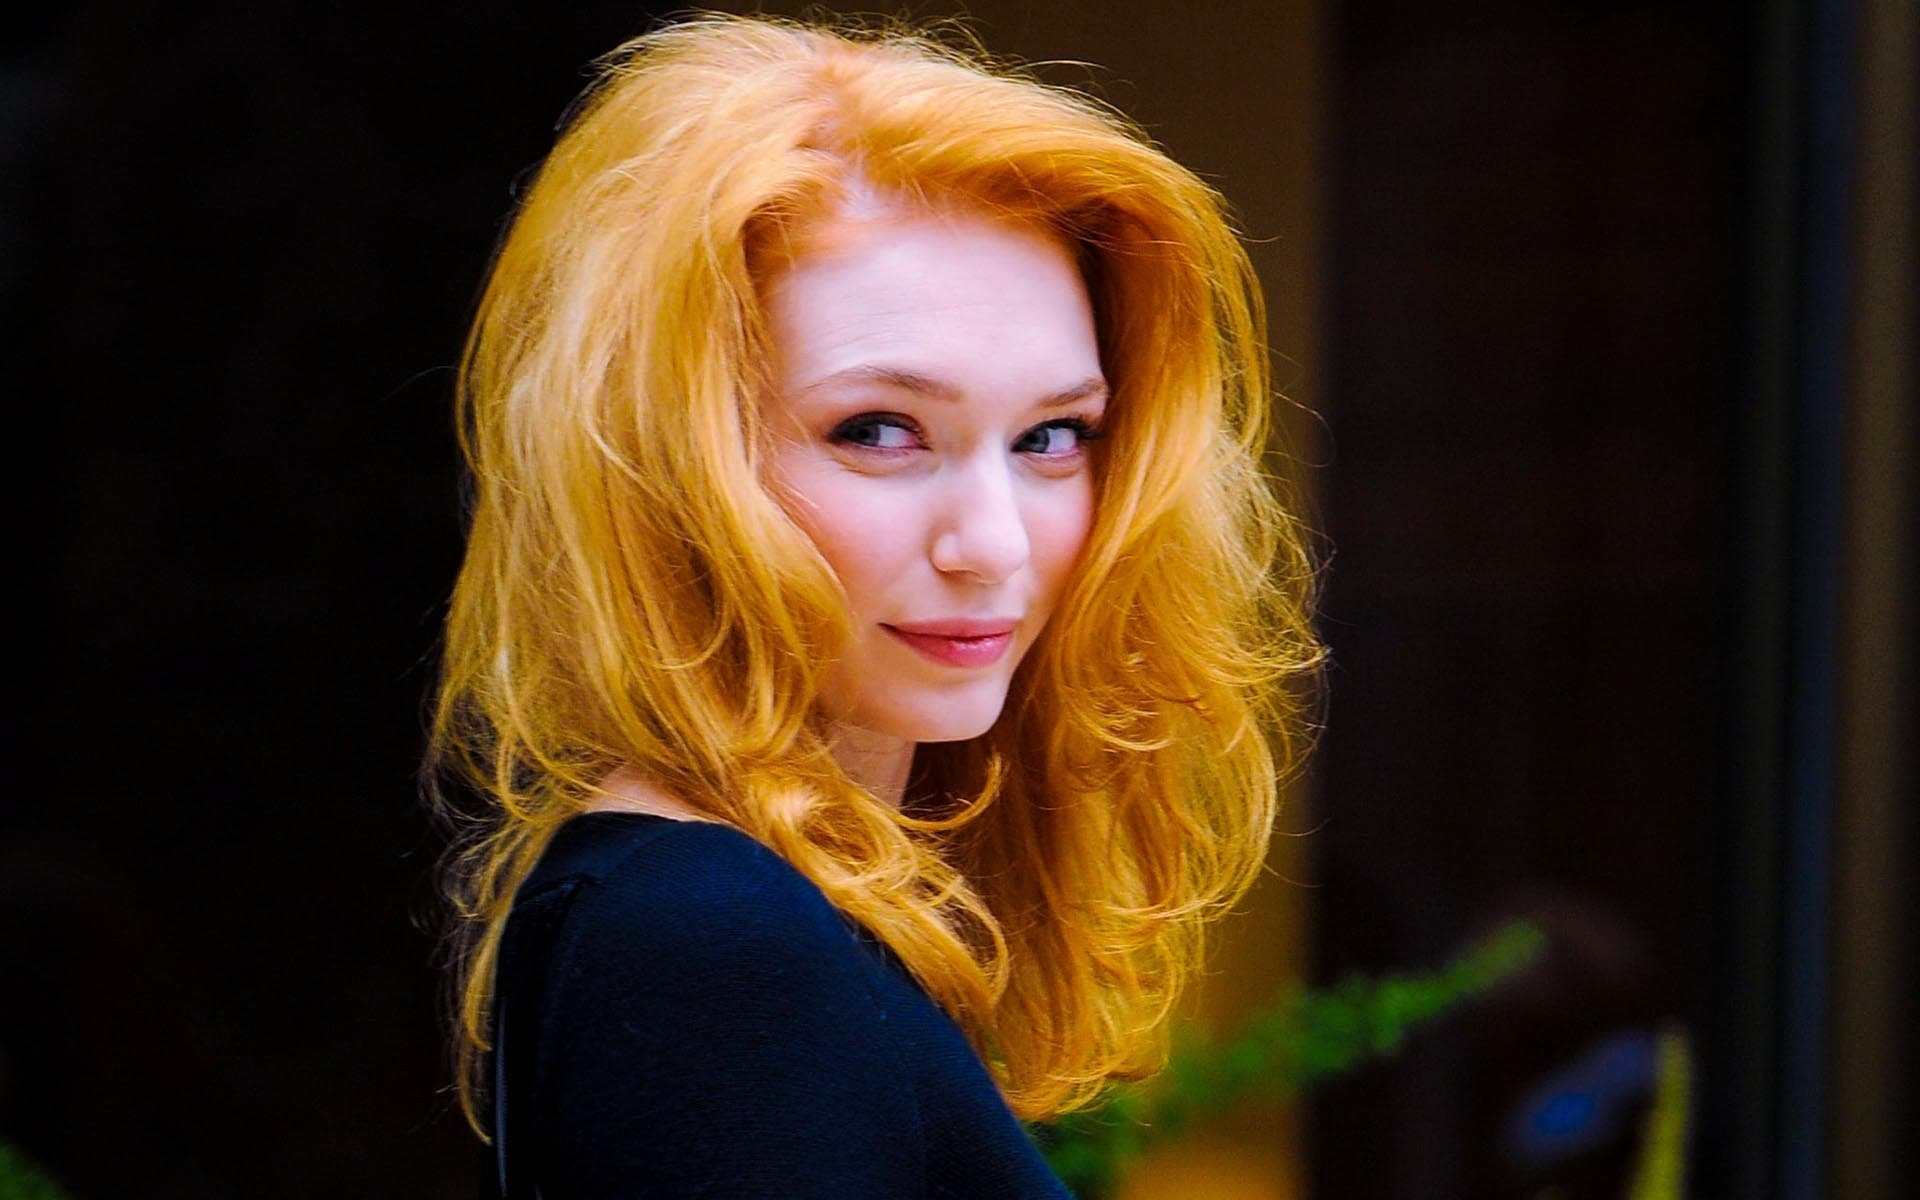 British redhead actress